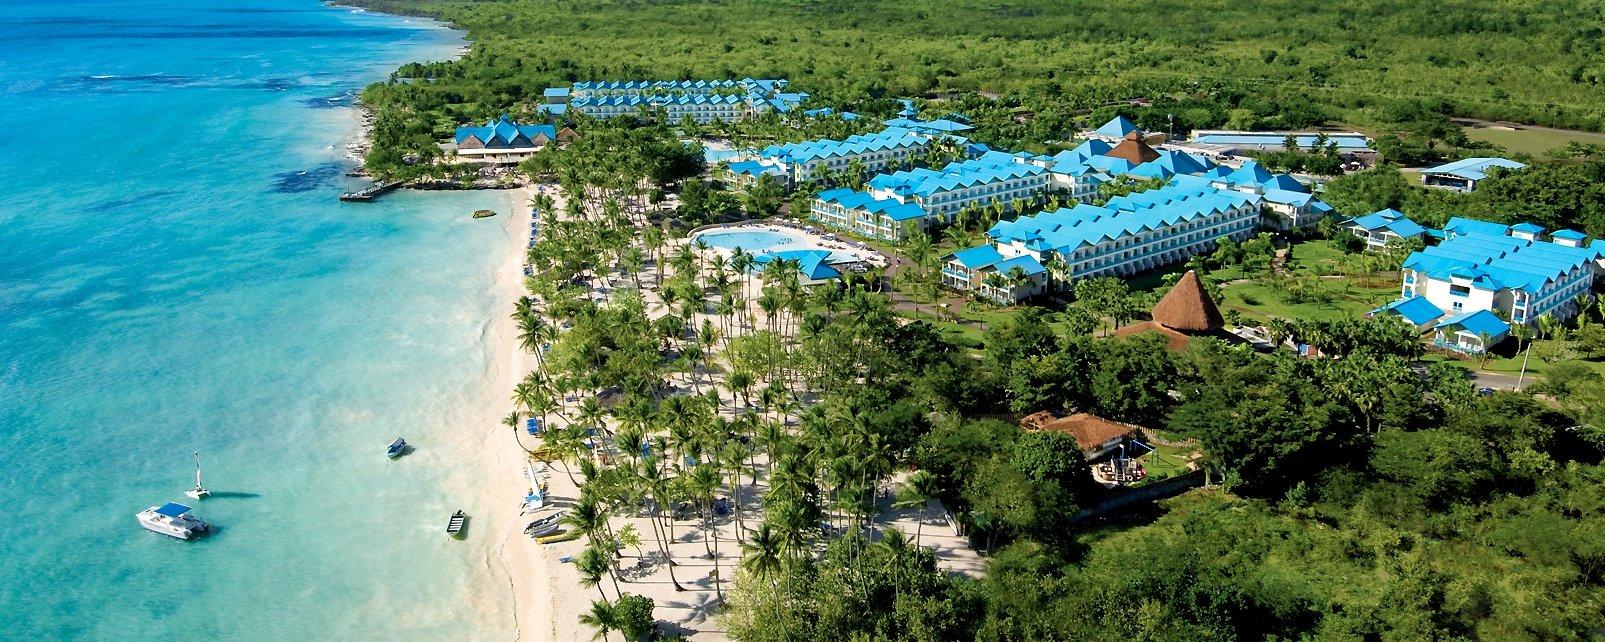 Hôtel Dreams La Romana Resort and Spa